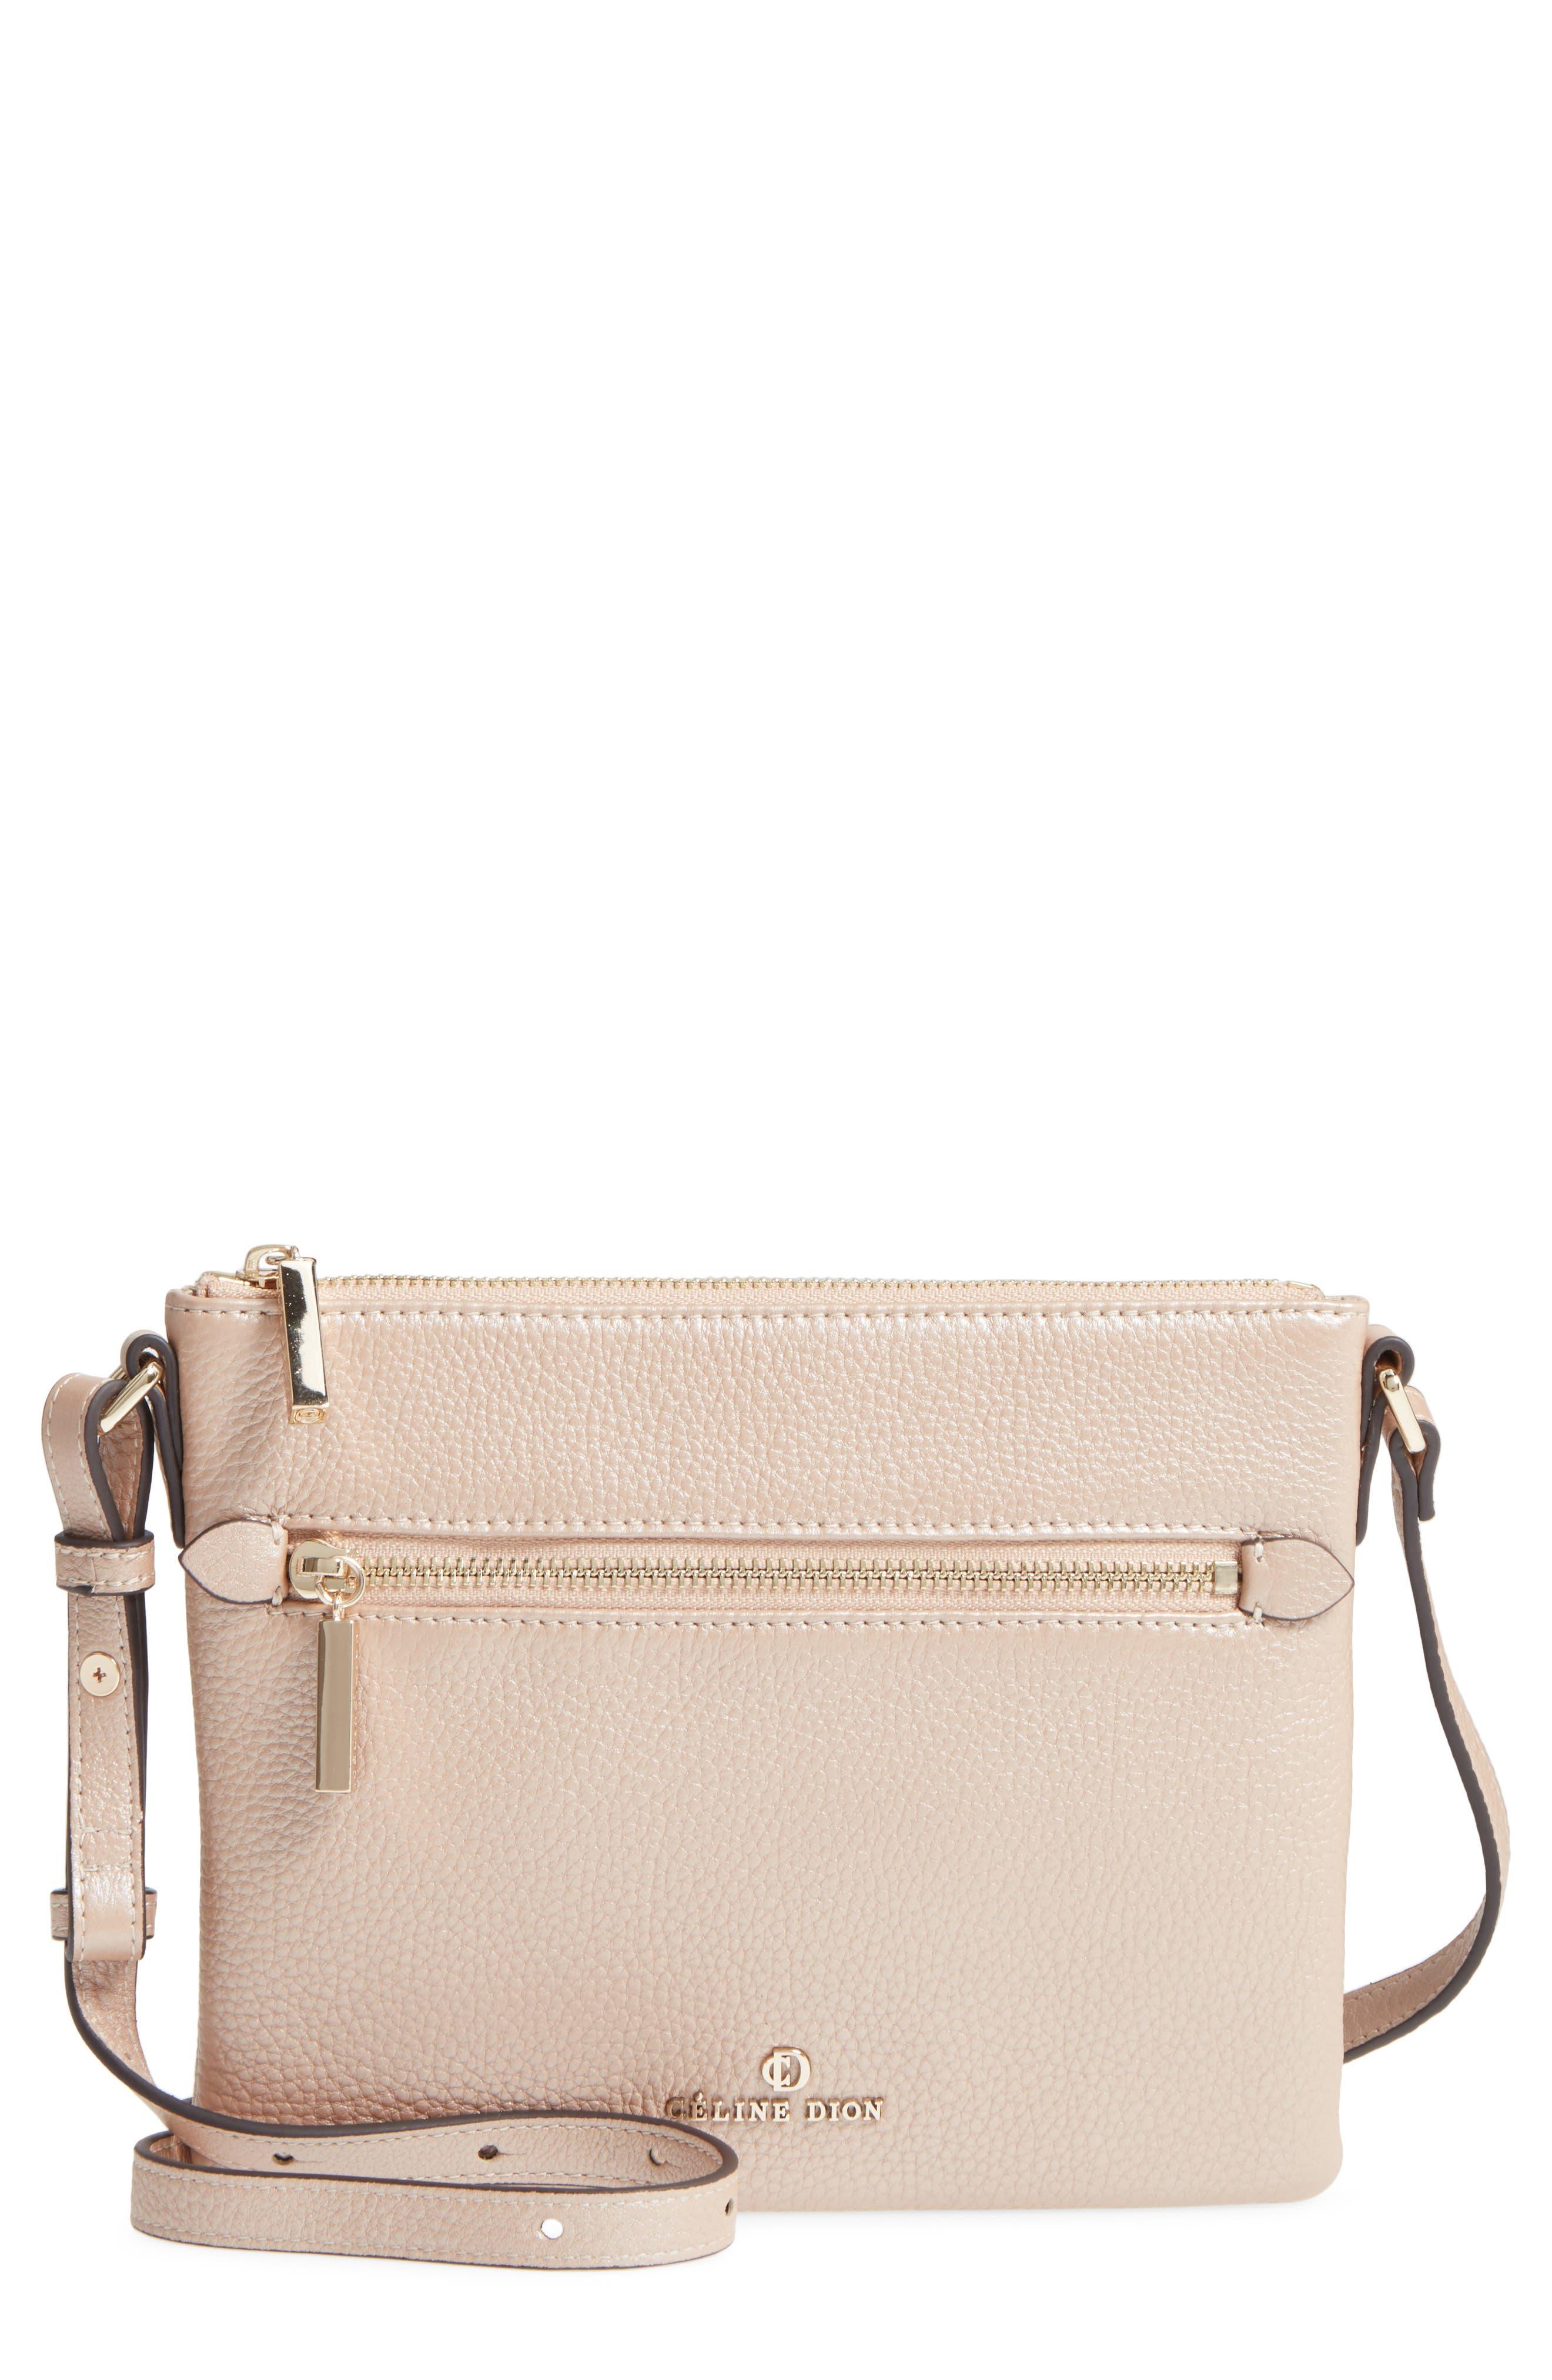 Céline Dion Adagio Leather Crossbody Bag,                         Main,                         color, Rose Gold